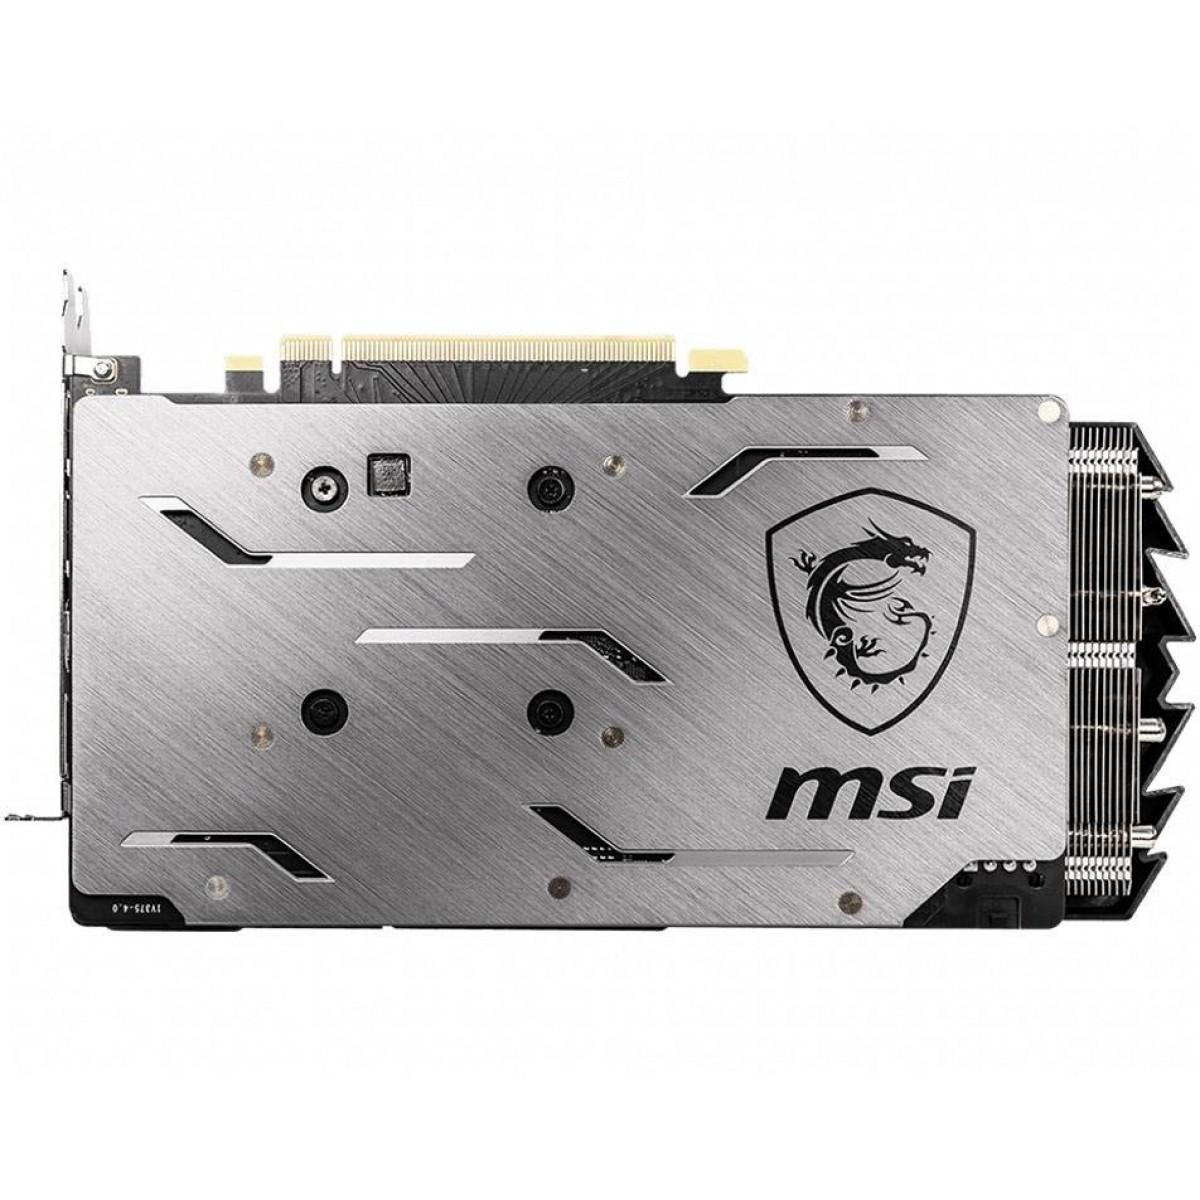 Placa de Video MSI, GeForce, RTX 2060 Super GAMING X, Dual, 8GB, GDDR6, 256Bit, 912-V375-214